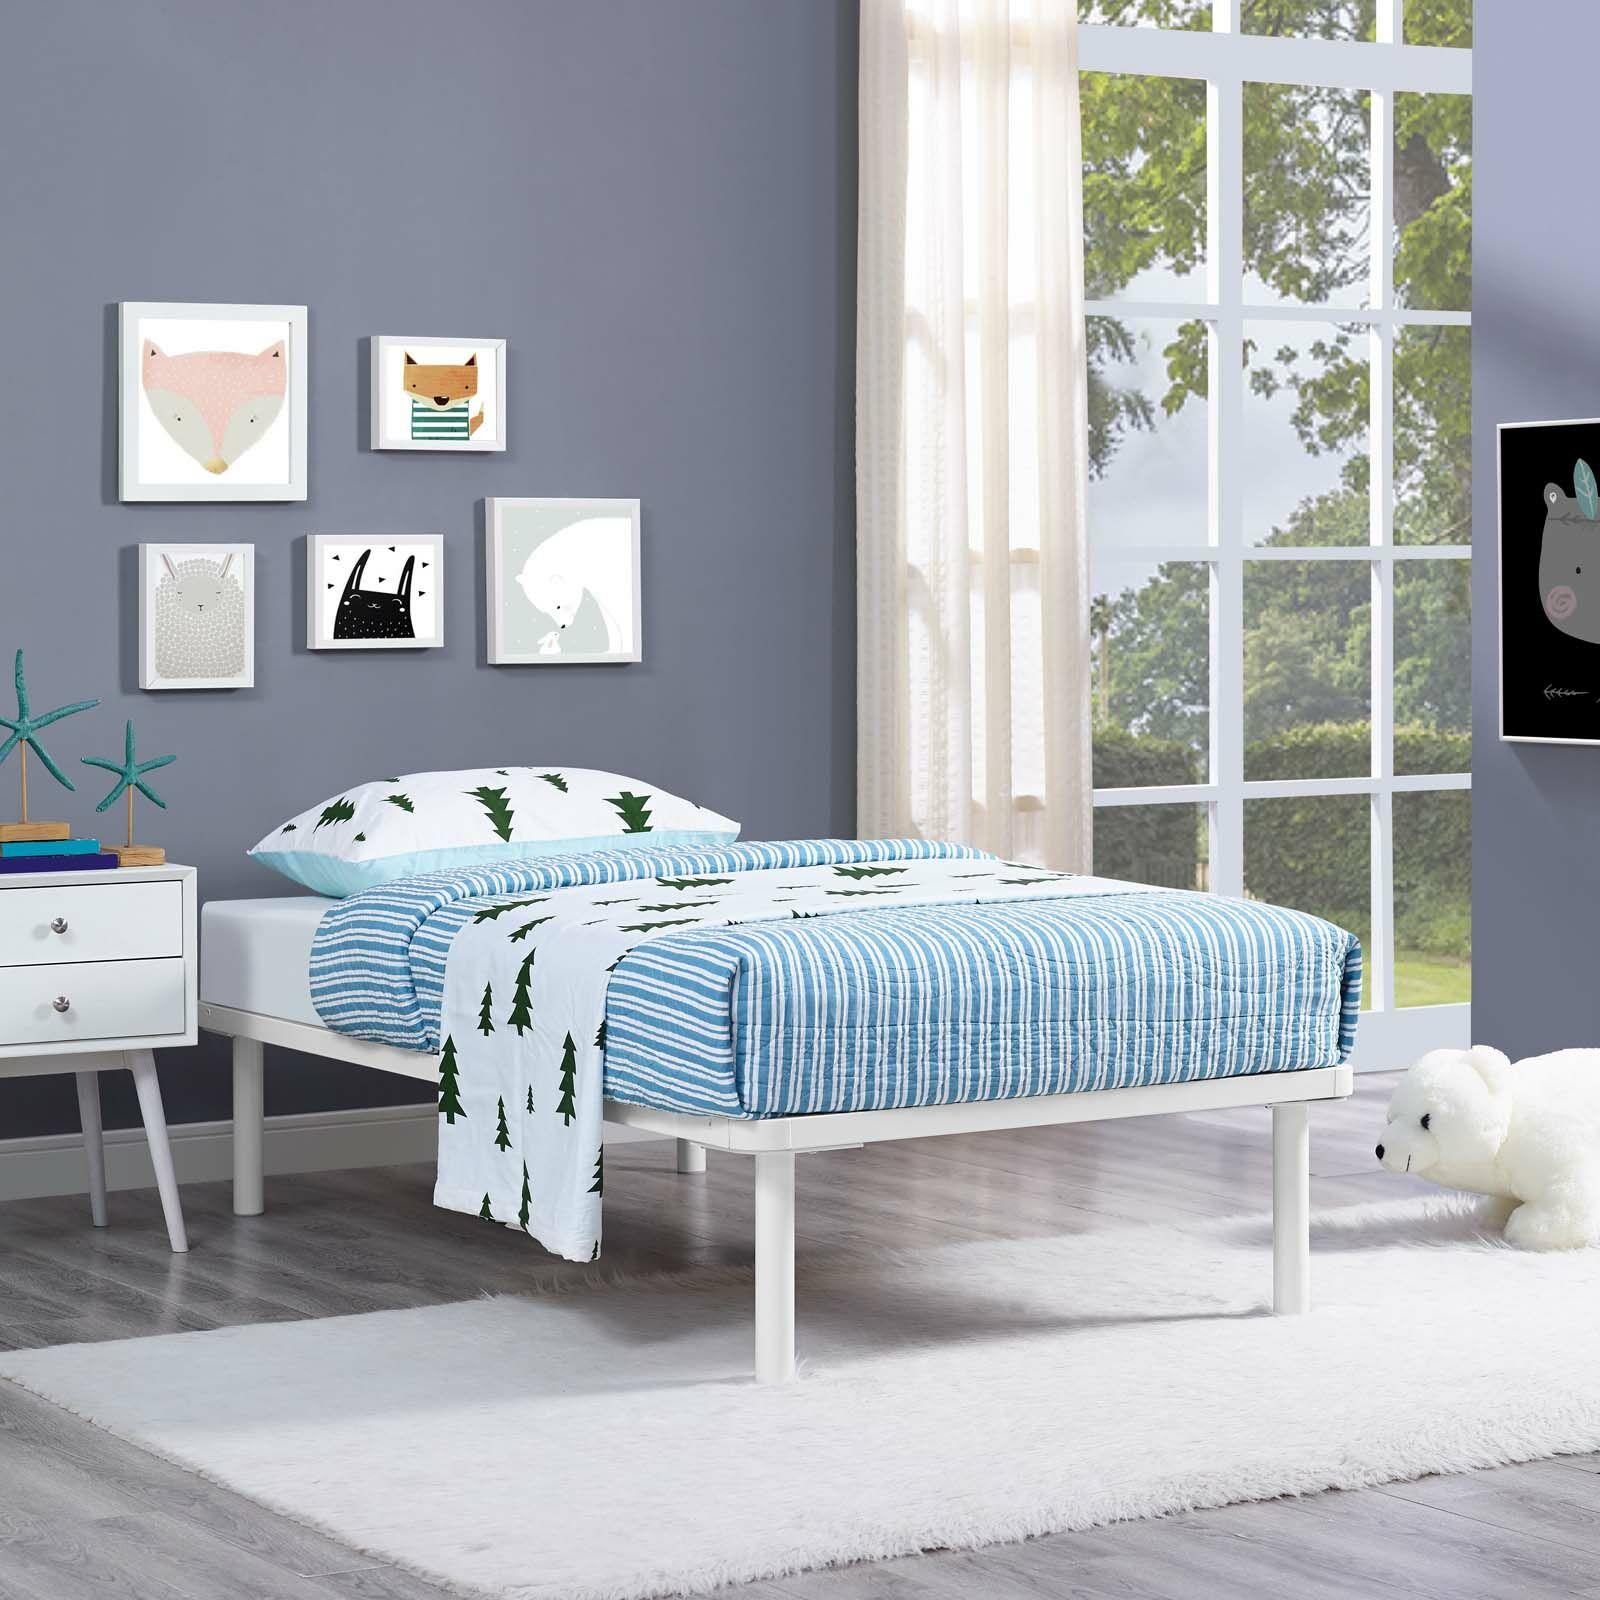 Daenerys Platform Bed Color: White, Size: Full